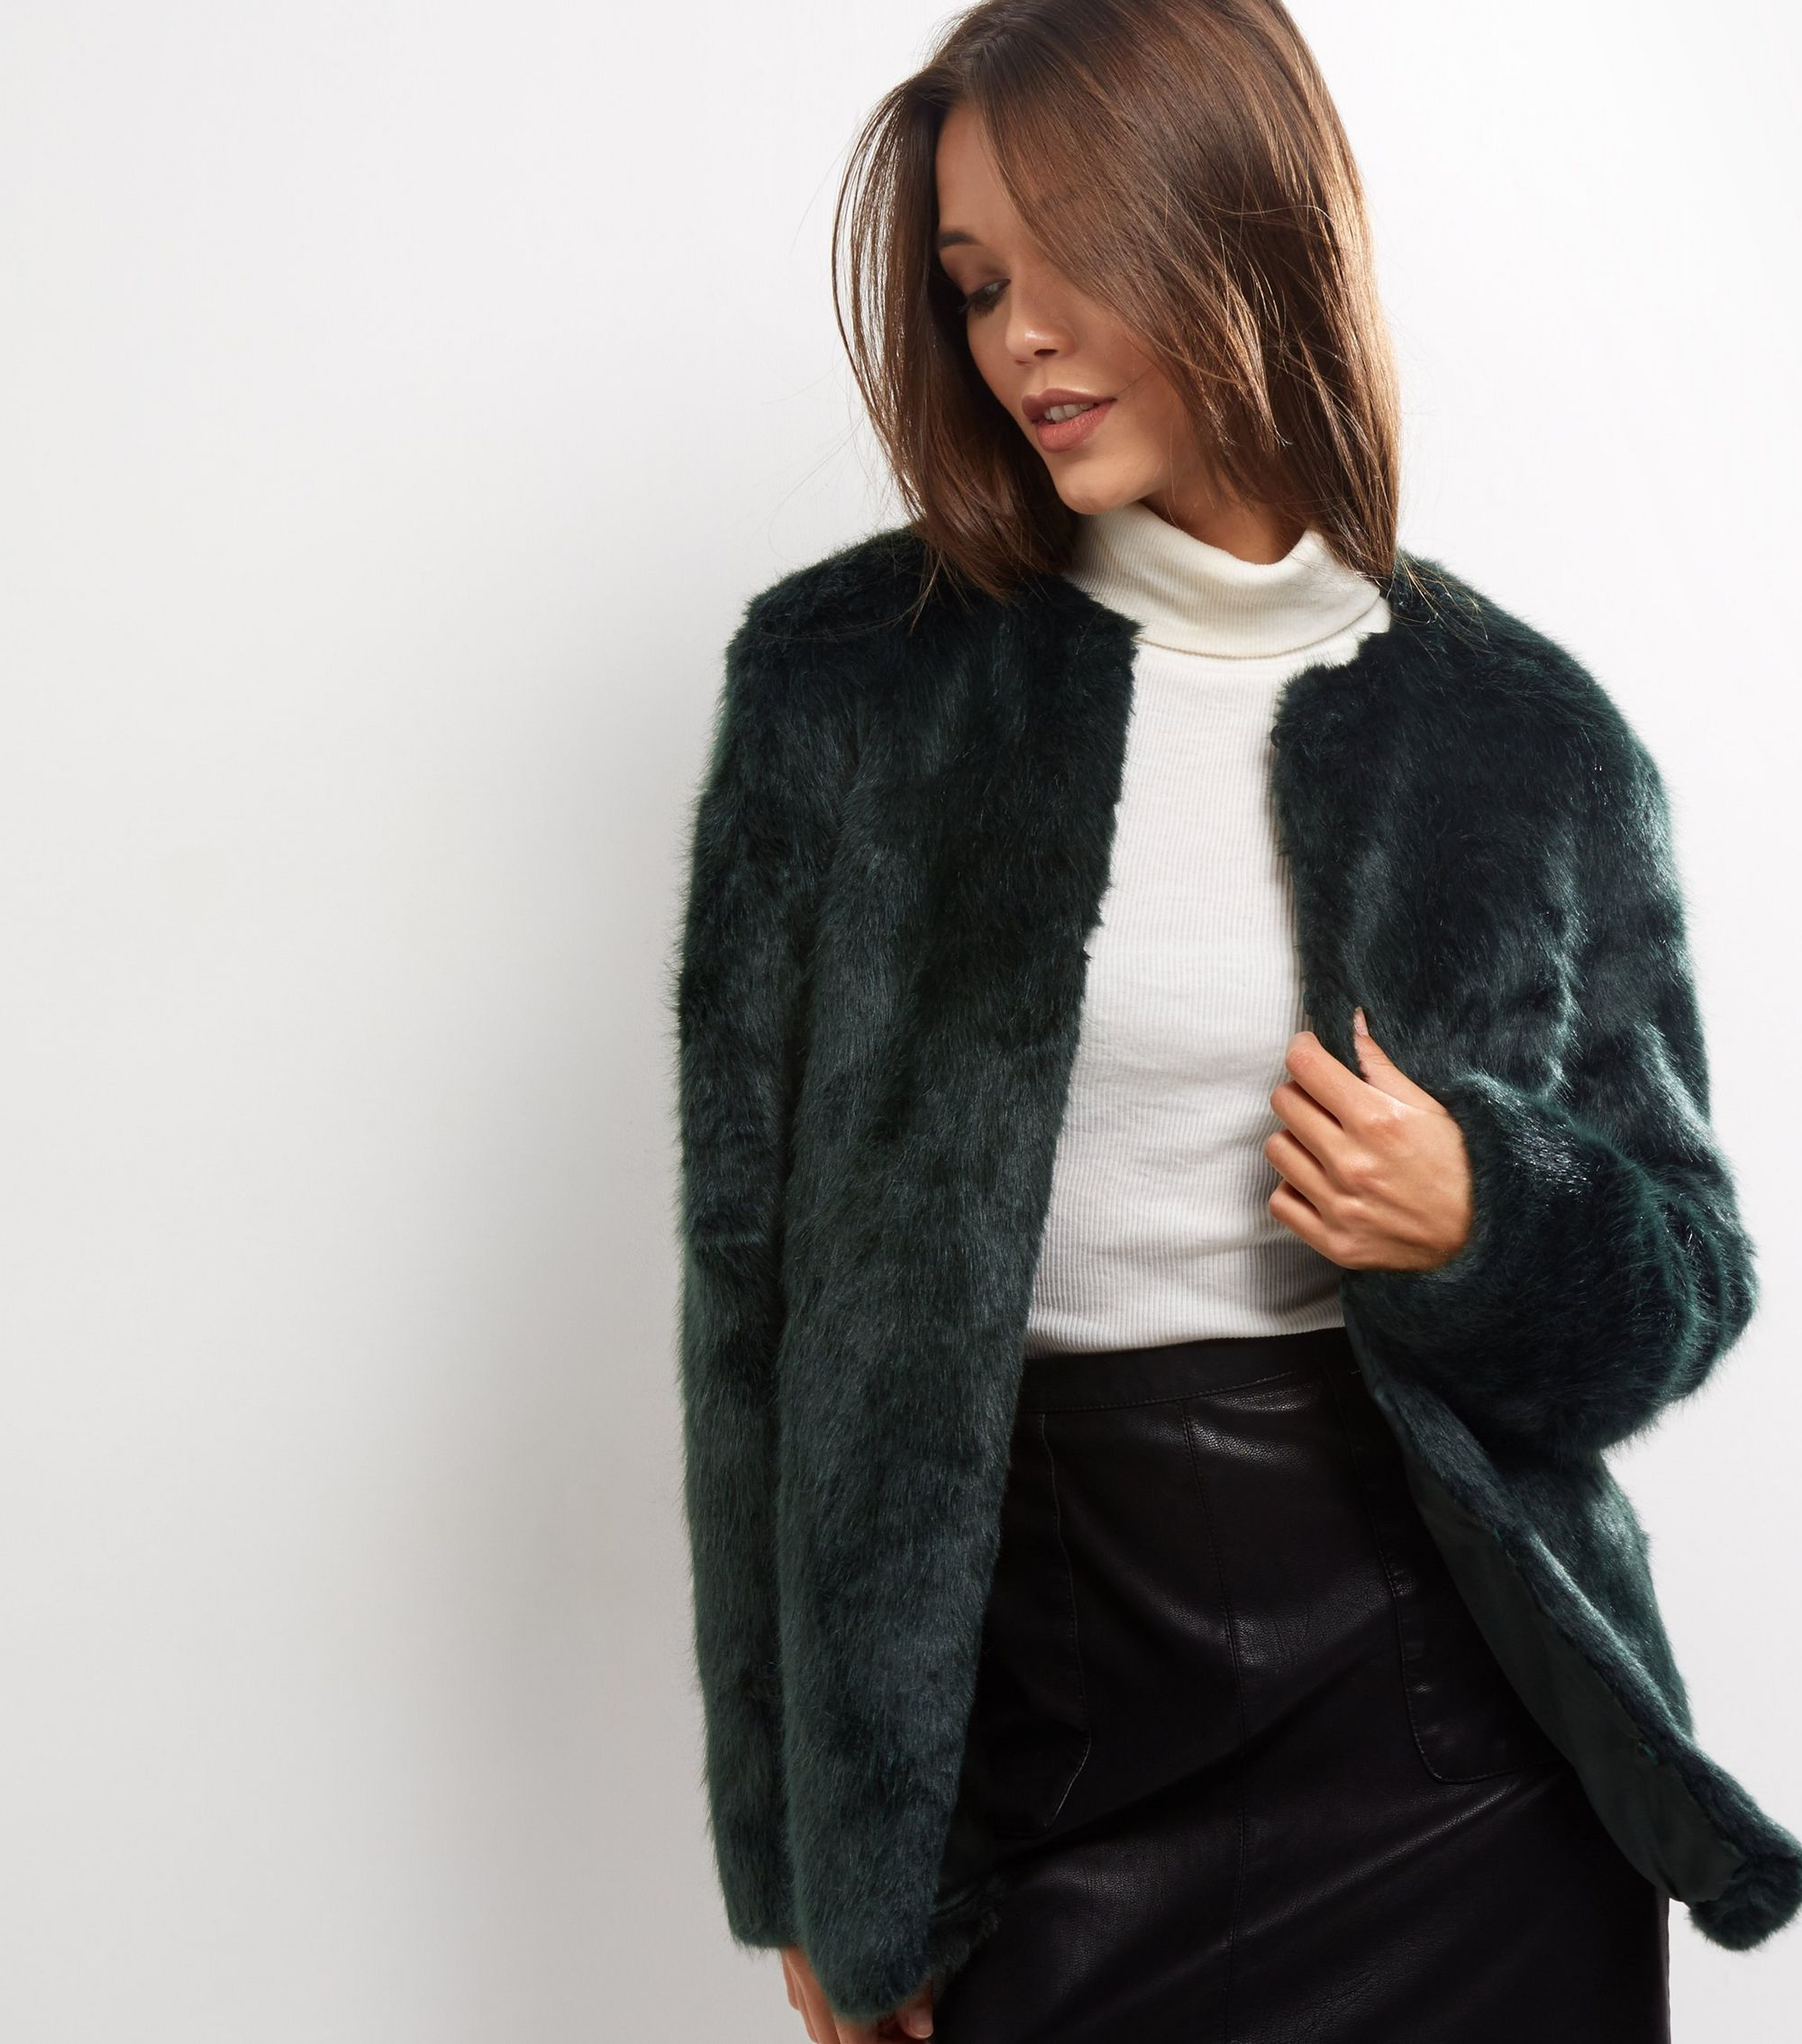 http://media.newlookassets.com/i/newlook/385359738/womens/jackets-and-coats/coats/dark-green-faux-fur-coat/?$new_pdp_szoom_image_2000$